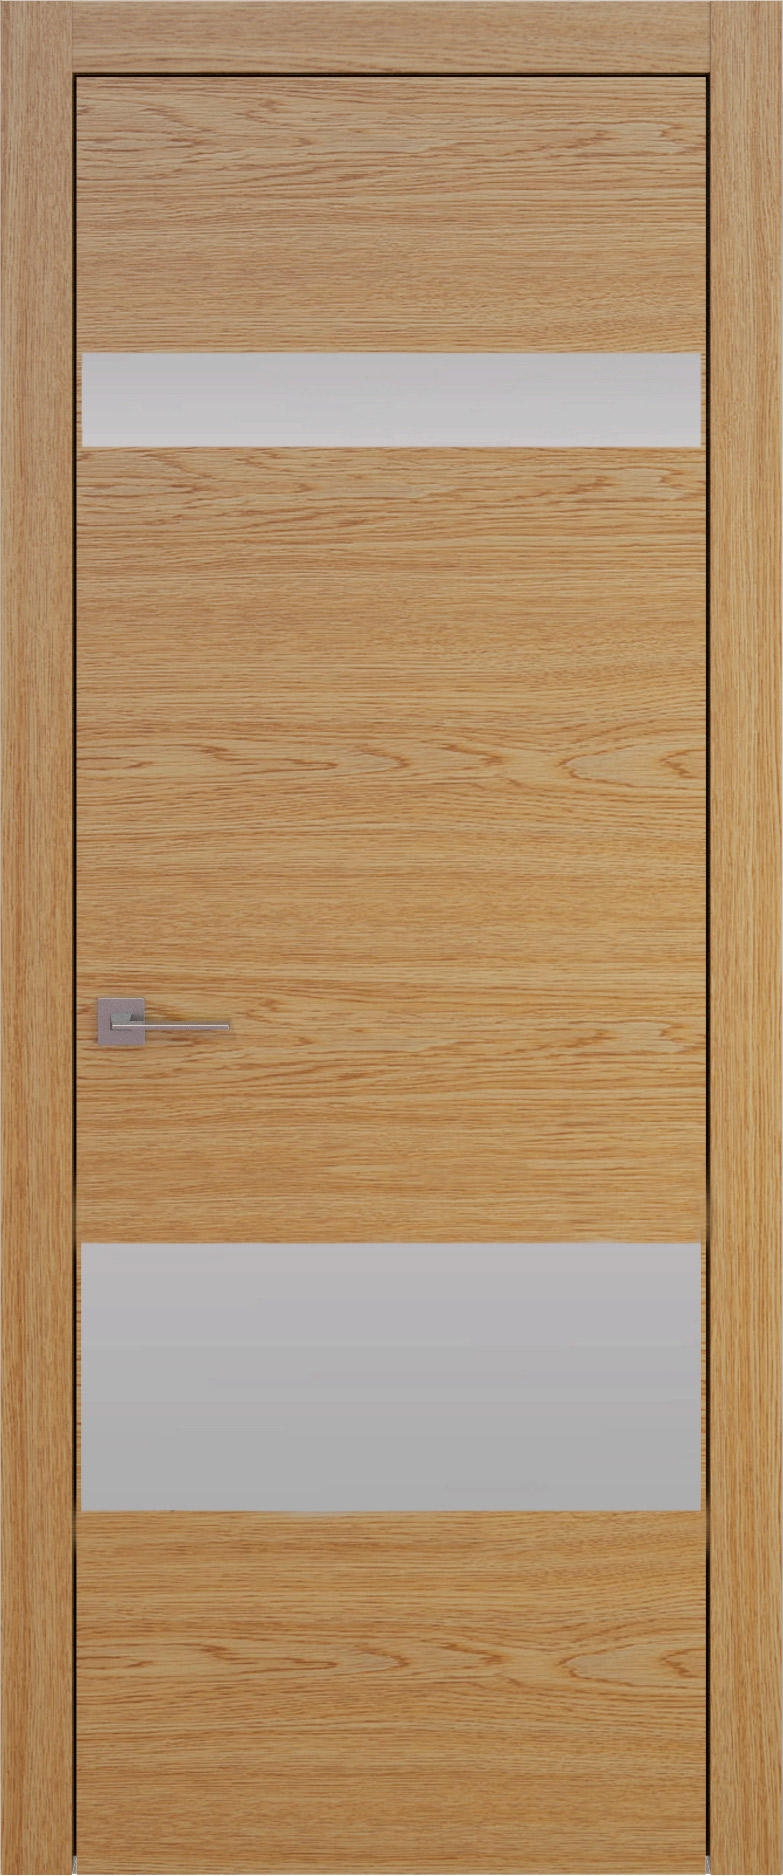 Tivoli К-4 цвет - Дуб карамель Без стекла (ДГ)